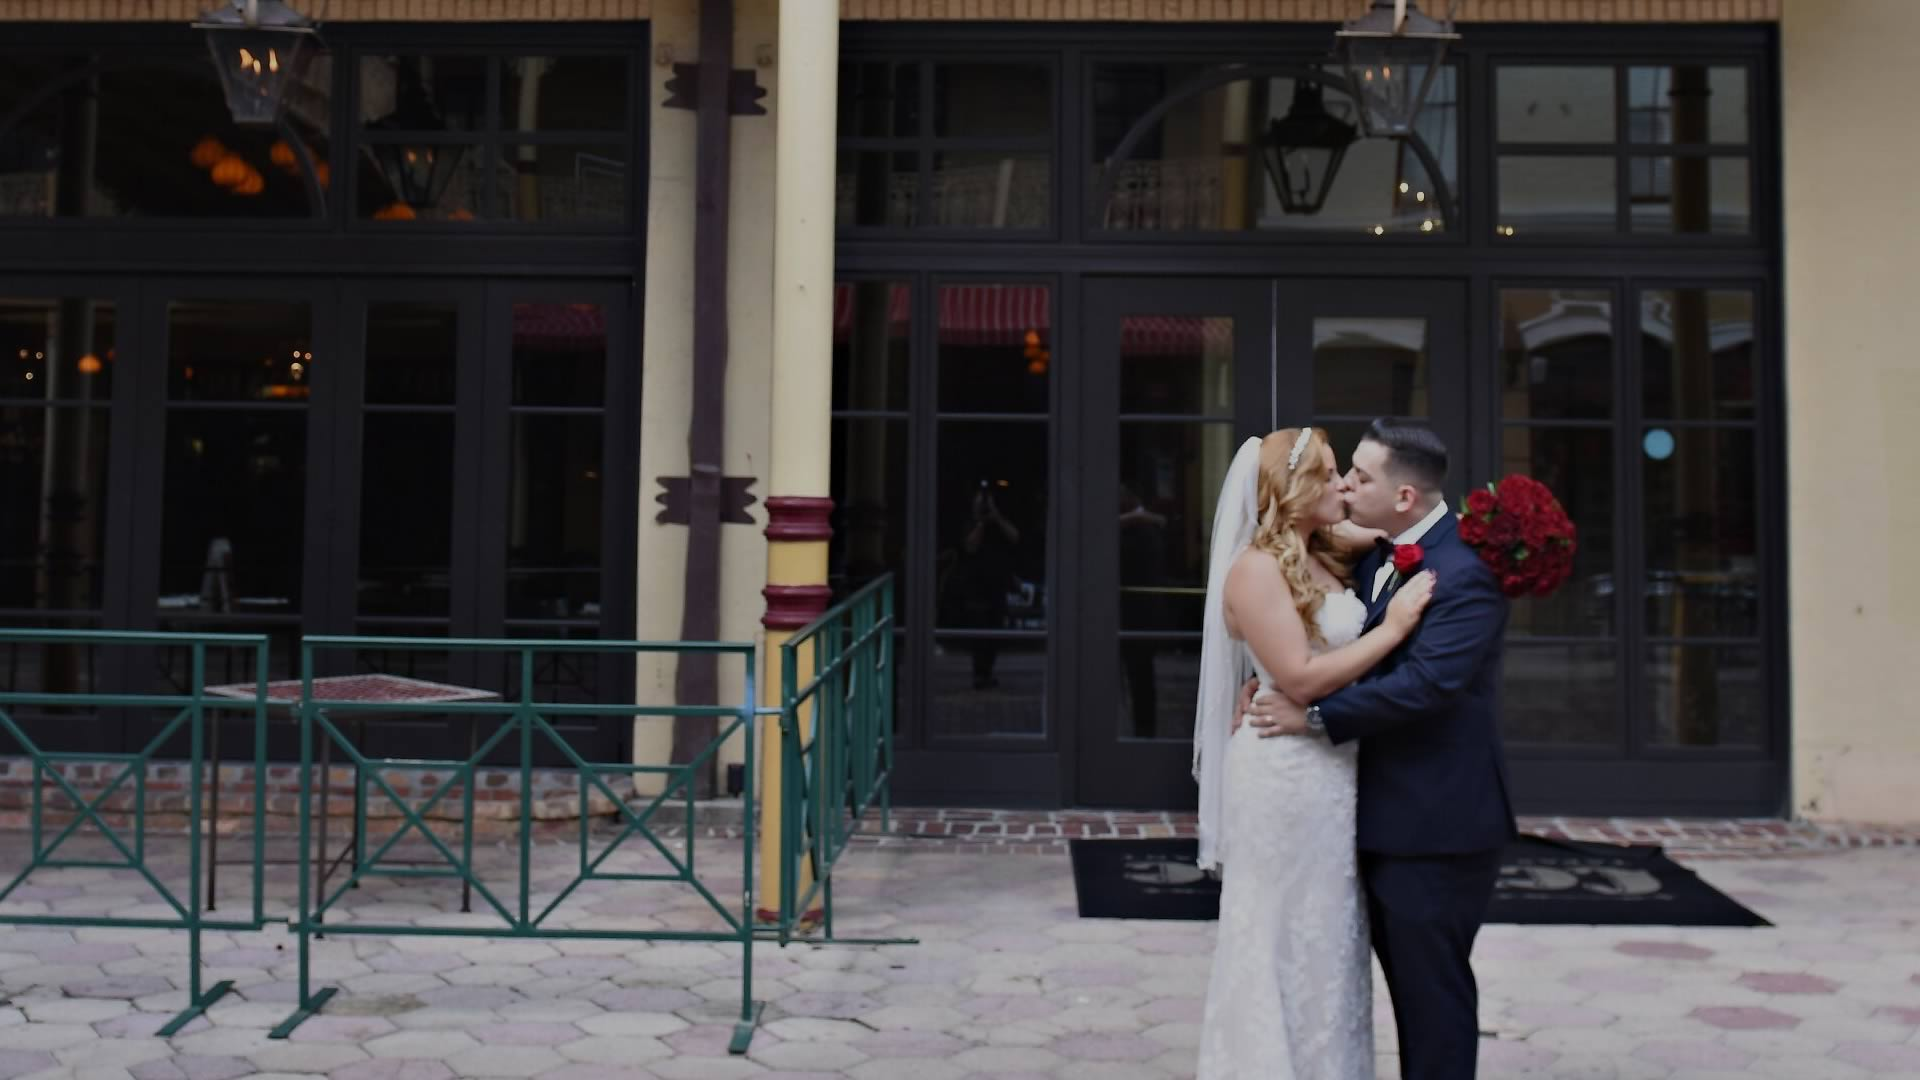 Ceviche Orlando - Sensational Ceremonies